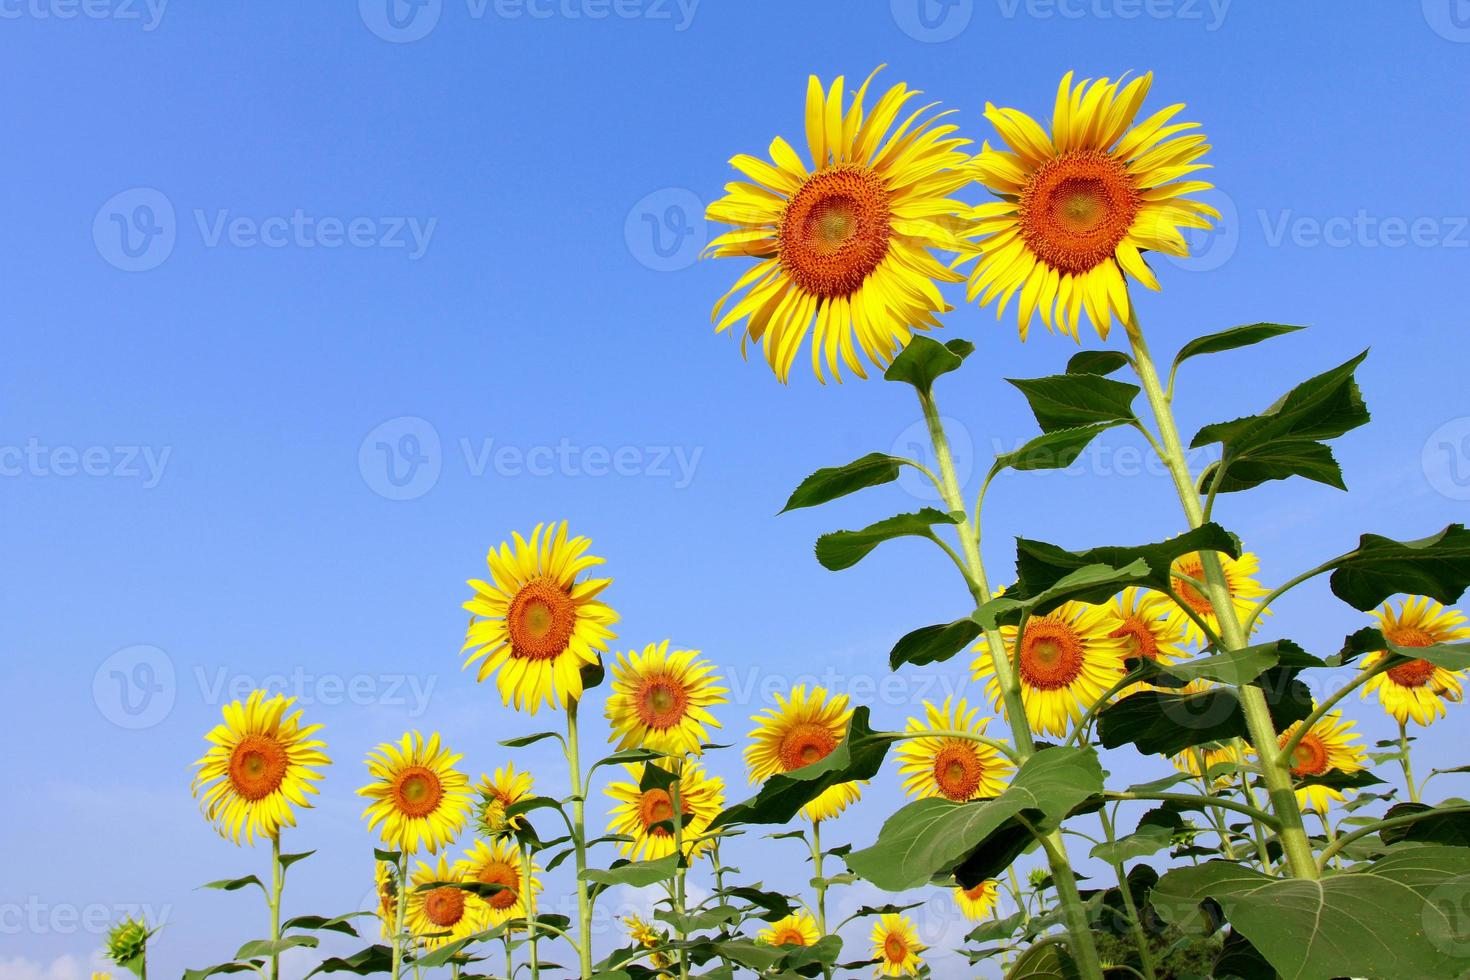 champ de tournesol avec ciel bleu photo